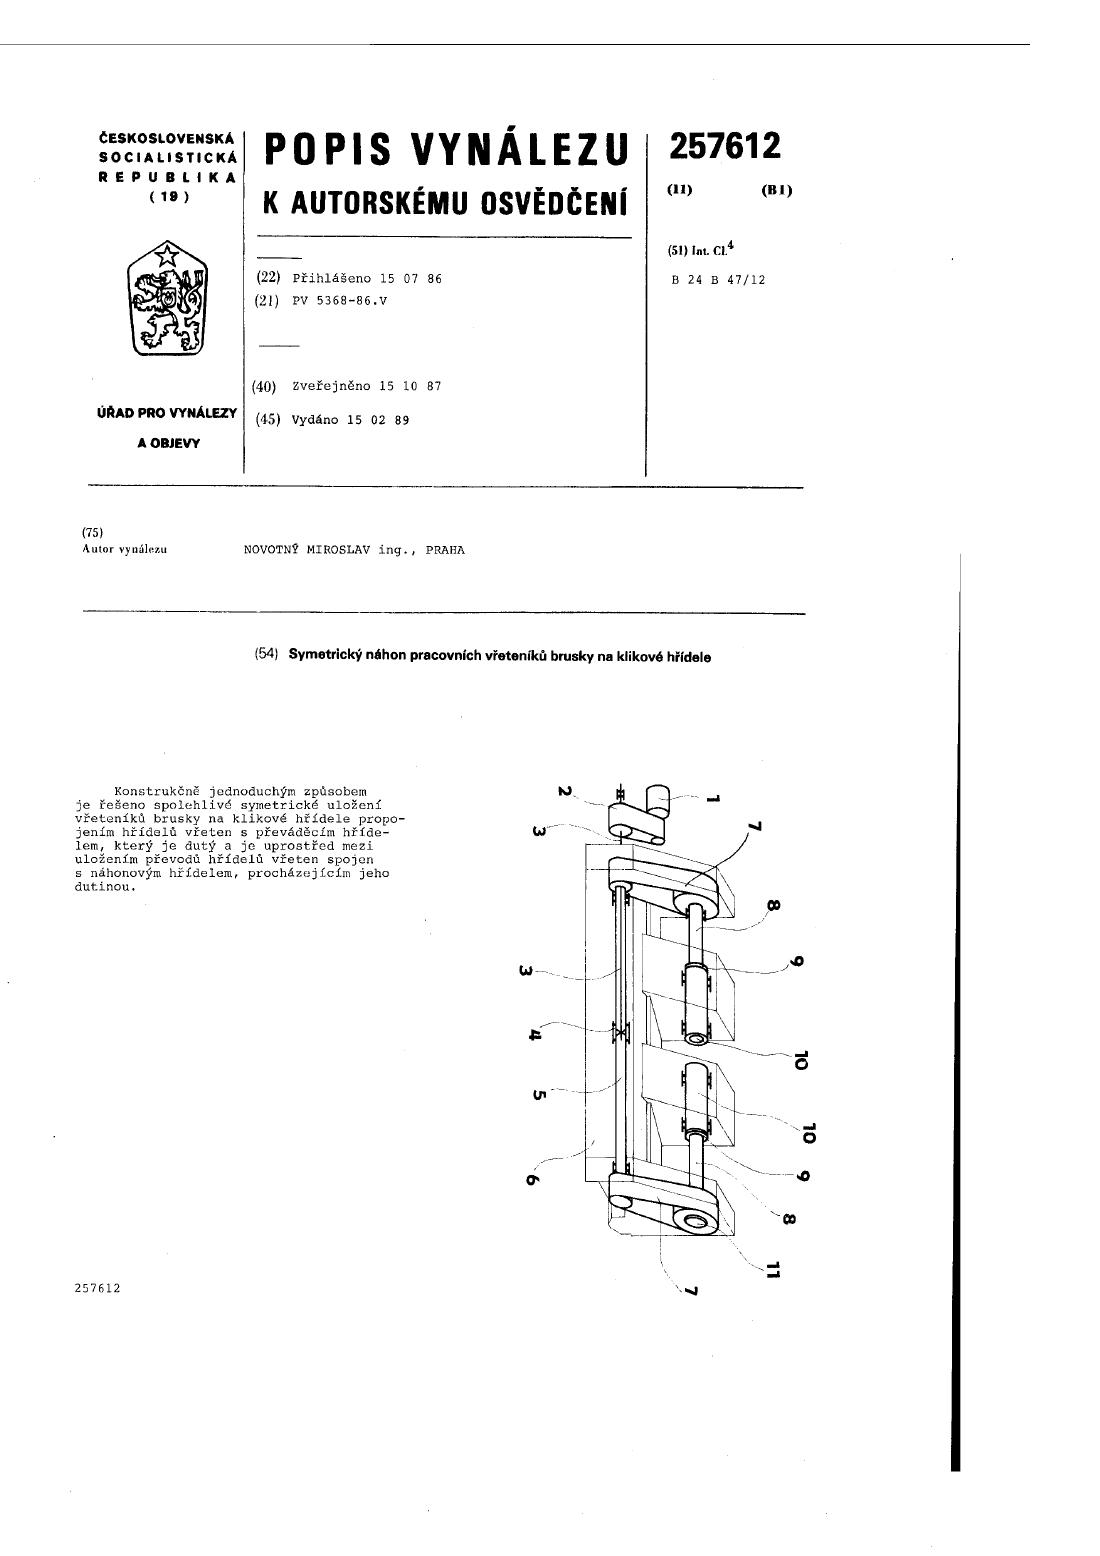 Symetricky Nahon Pracovnich Vreteniku Brusky Na Klikove Hridele